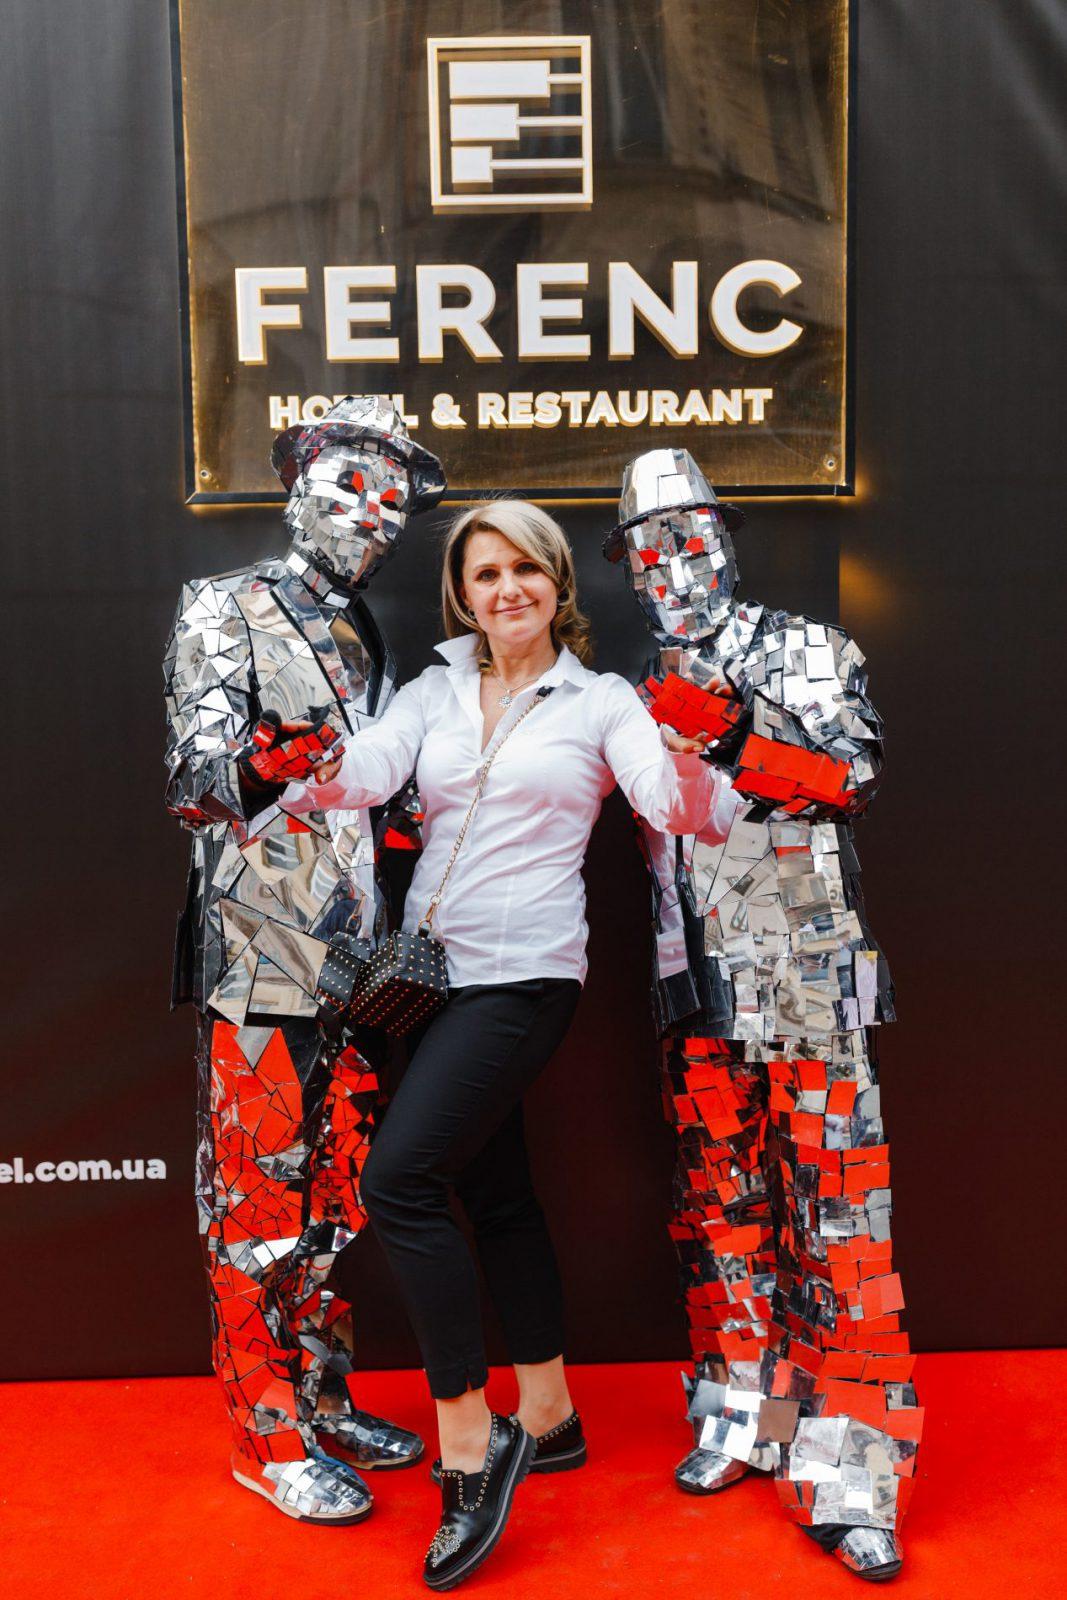 Ferenc0282